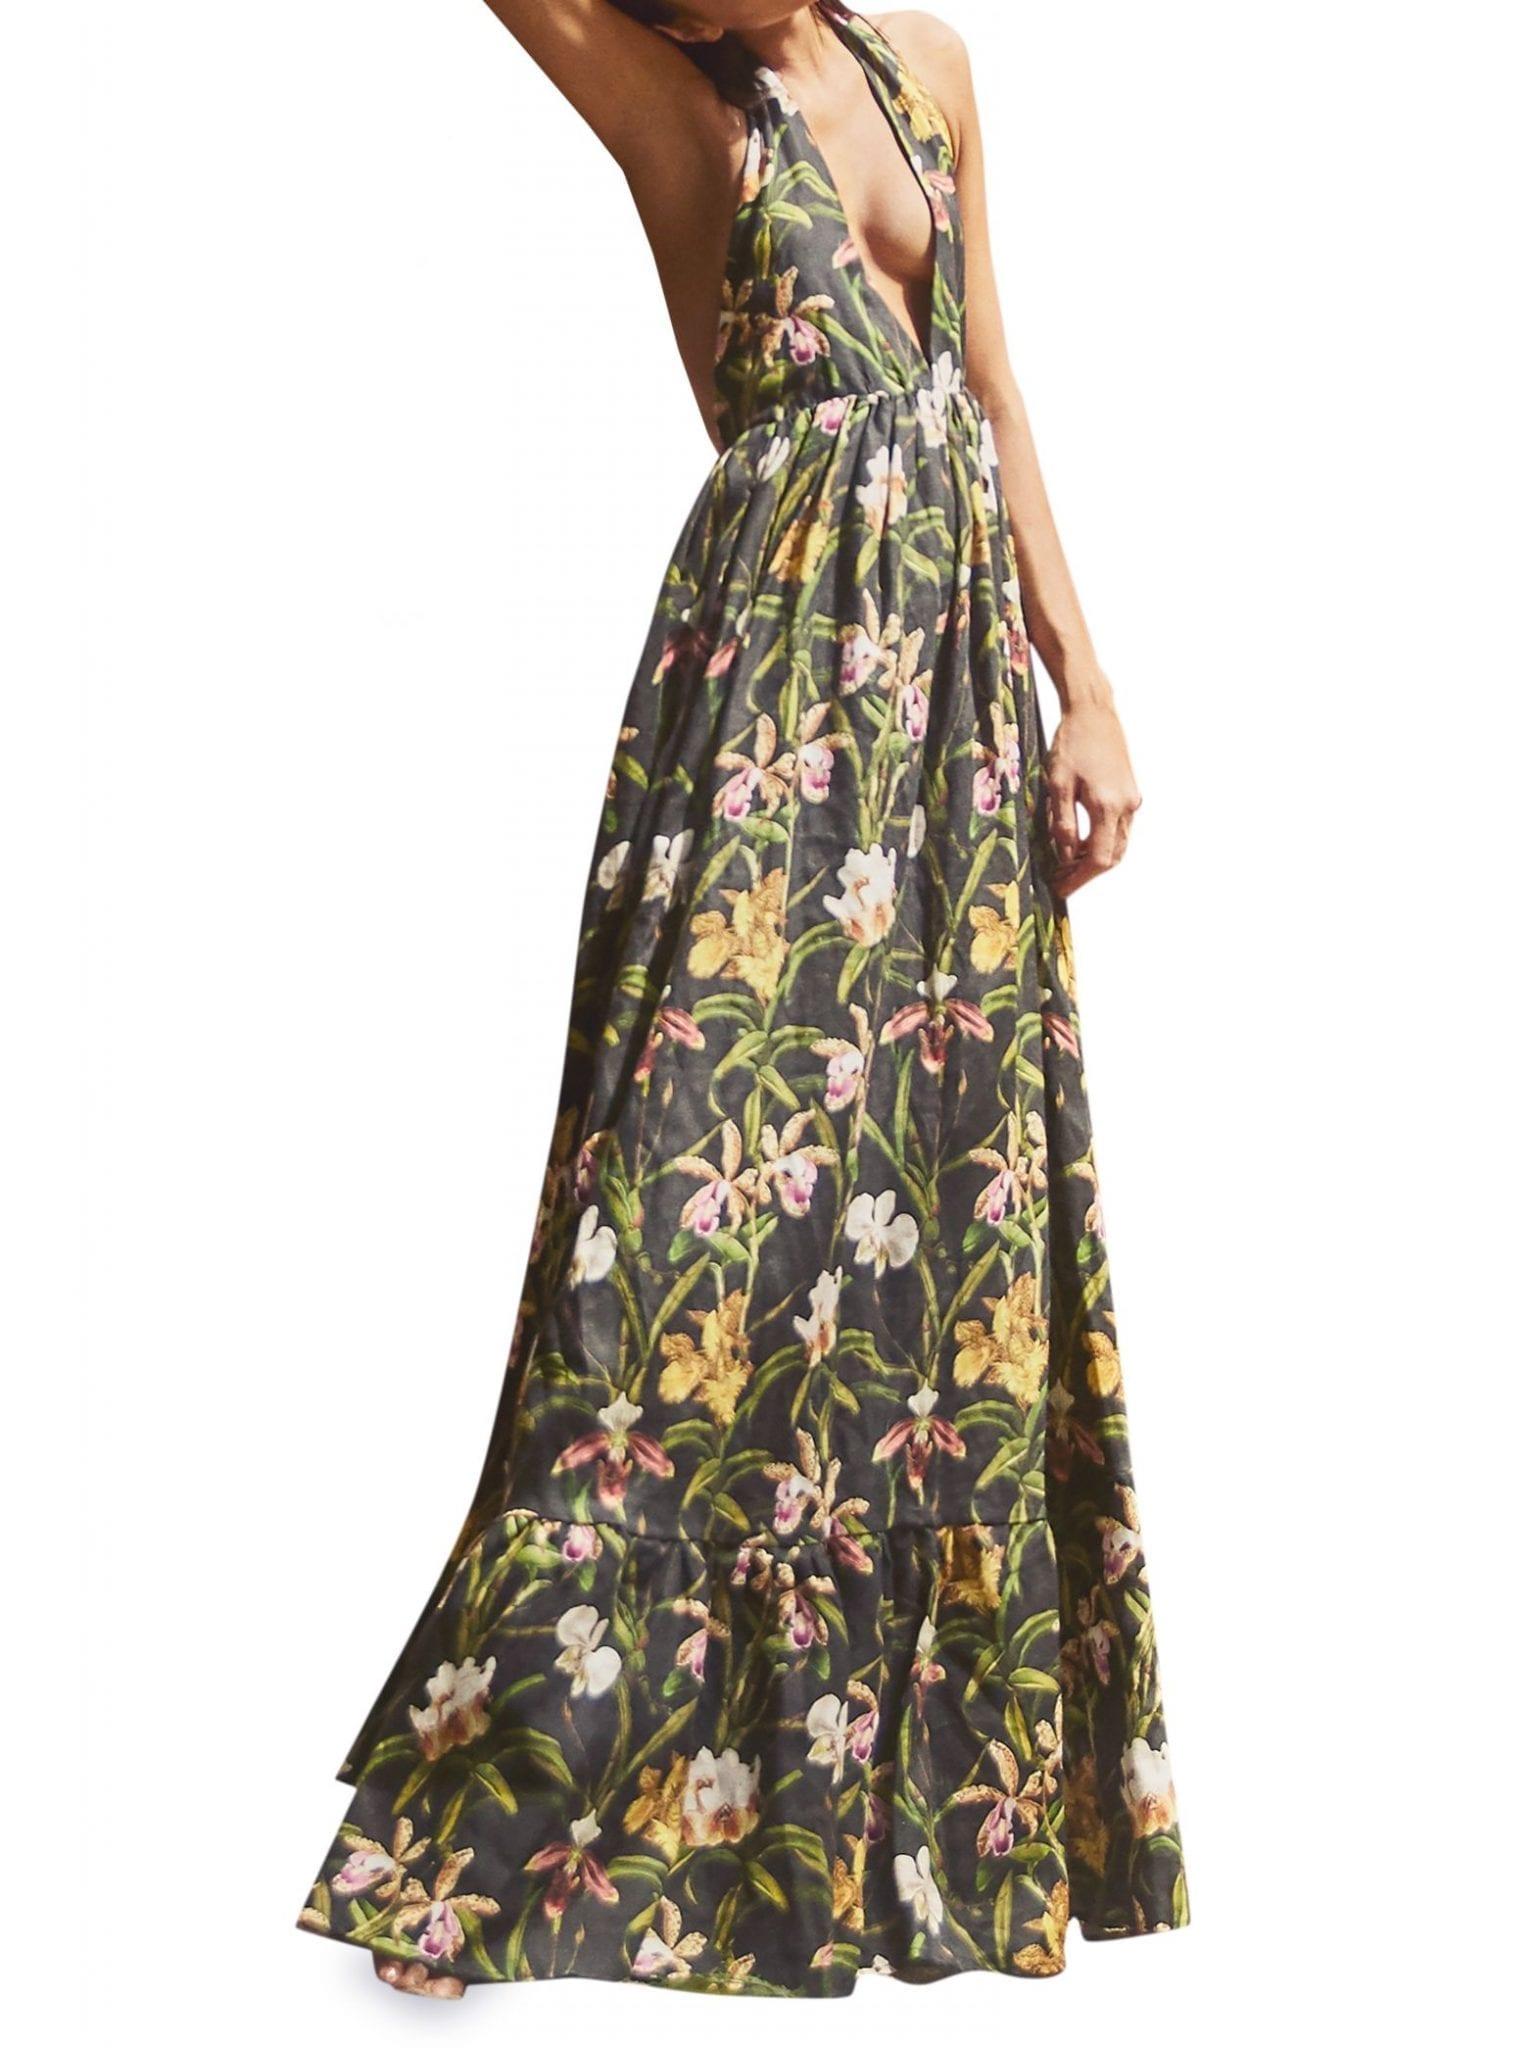 AGUA BY AGUA BENDITA Olivia Floral Maxi Dress